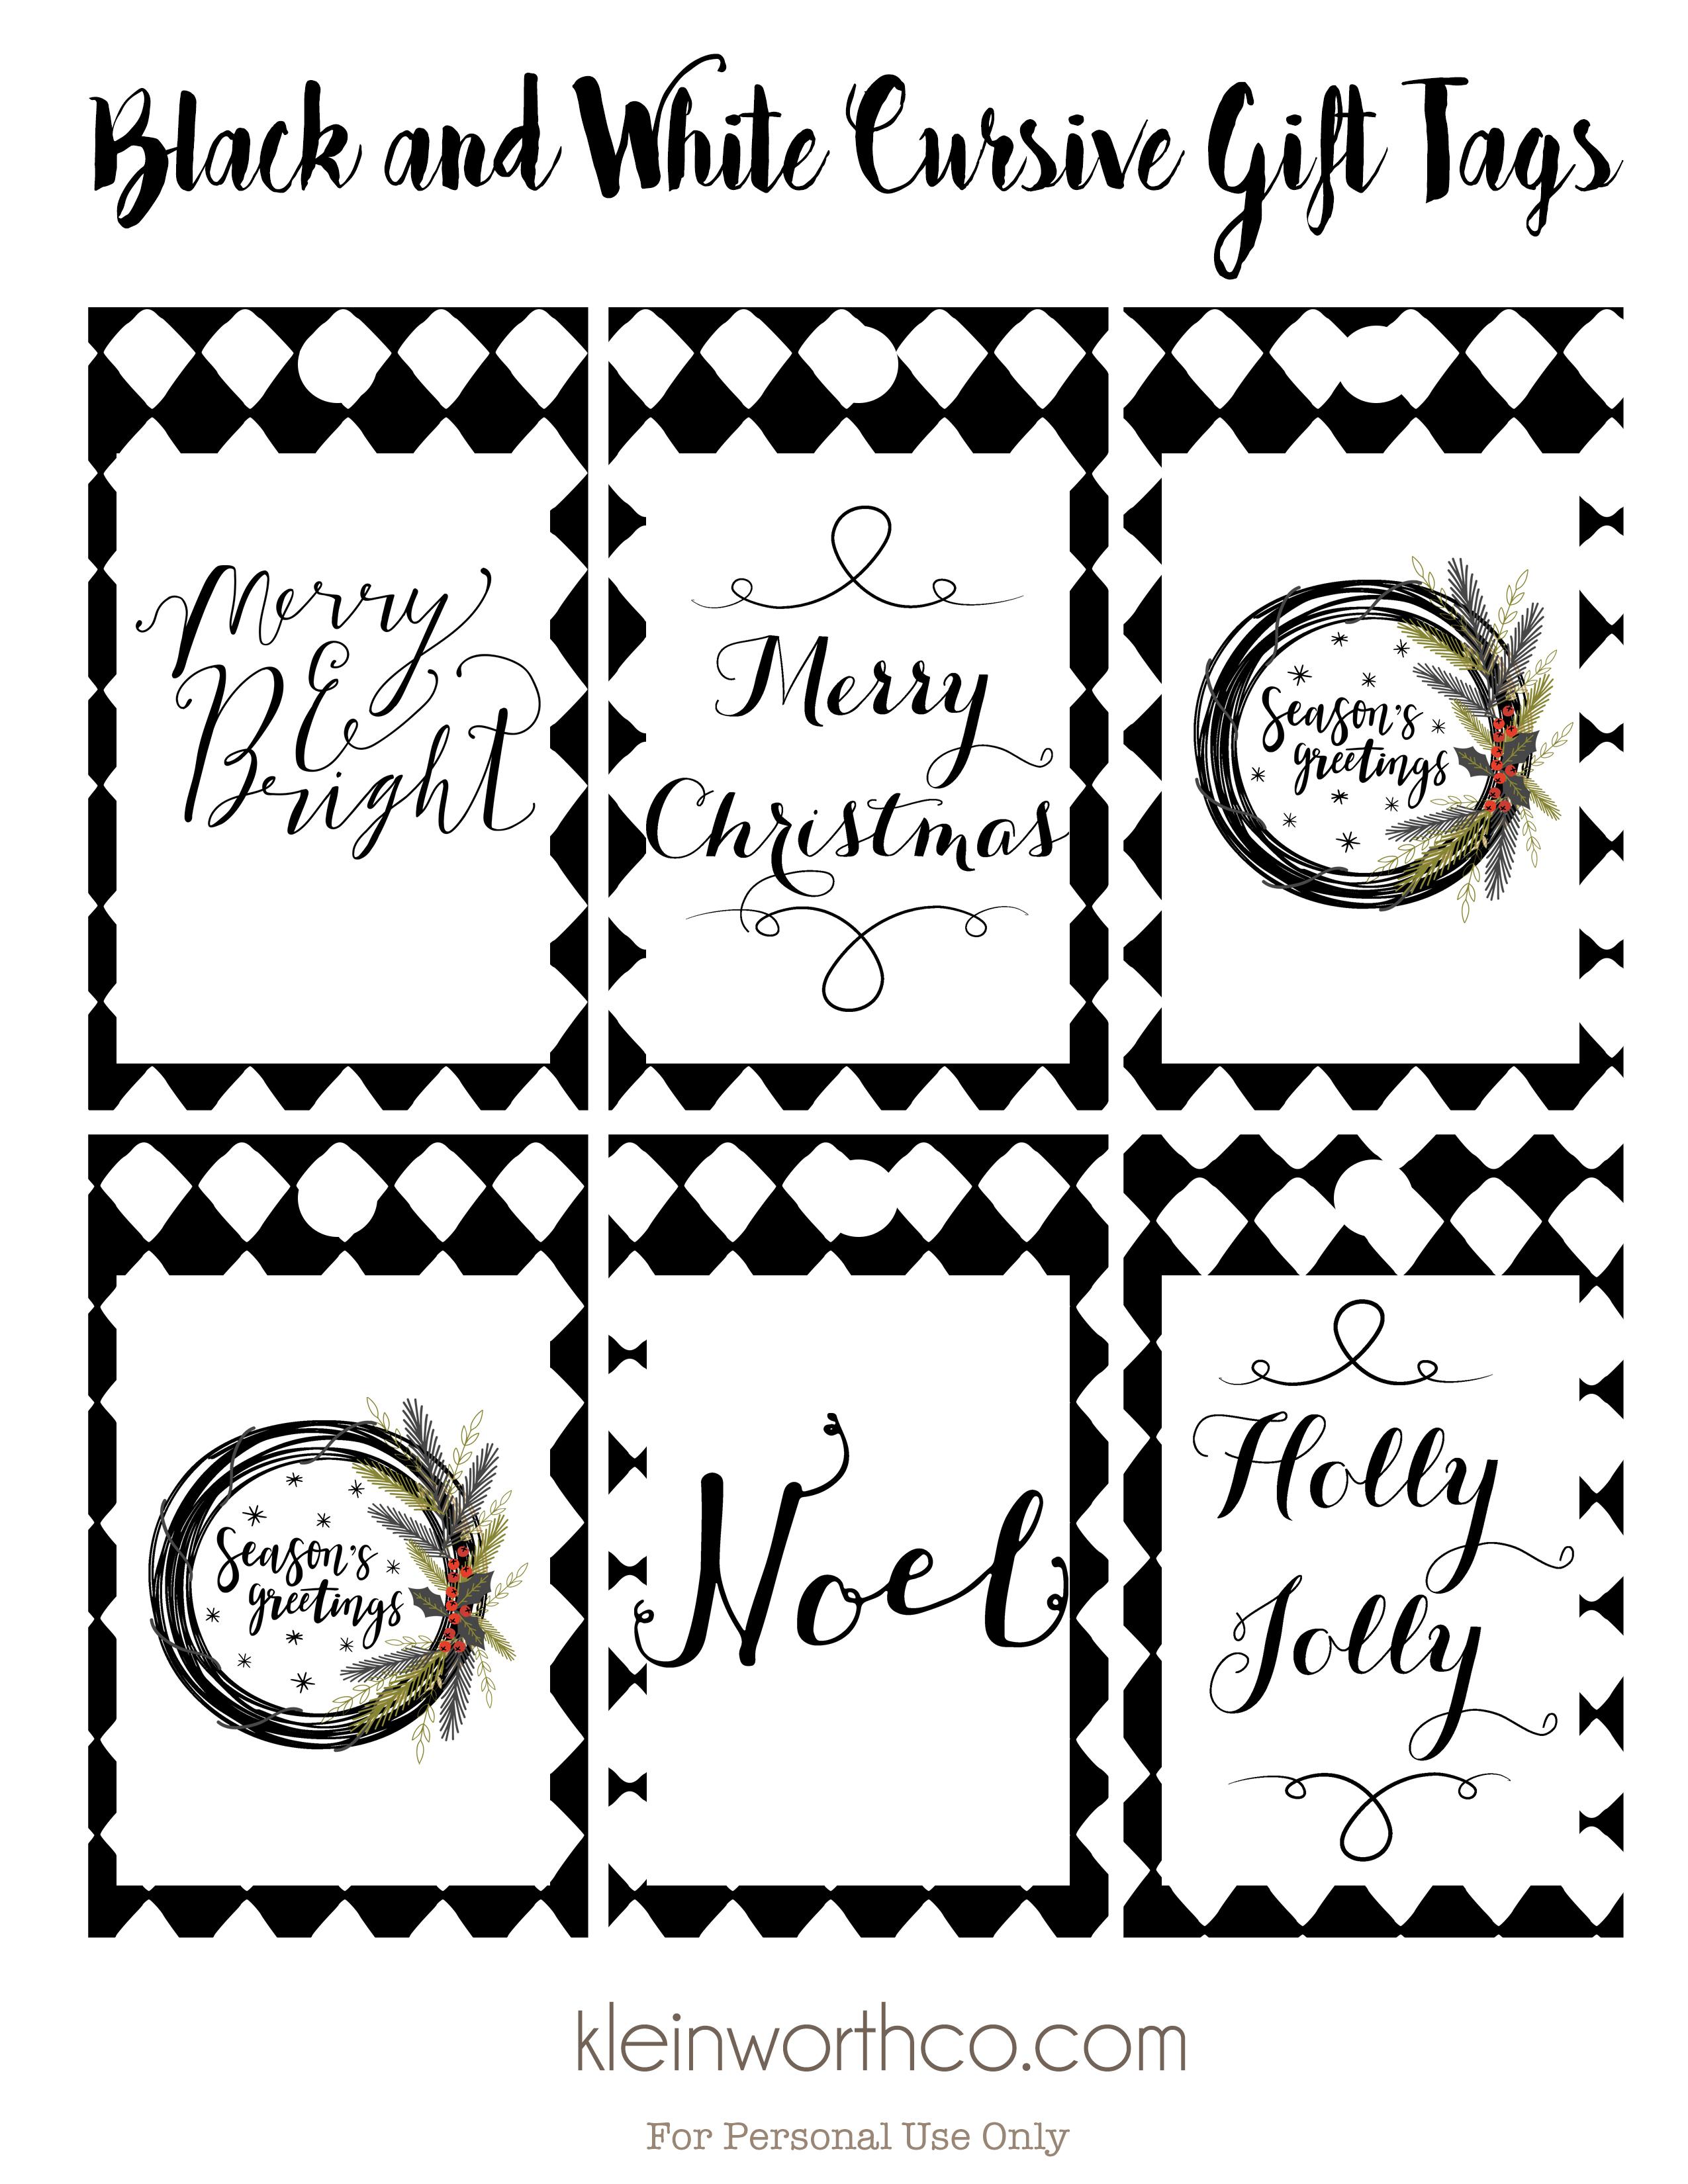 Black And White Cursive Free Printable Gift Tags - Kleinworth & Co - Christmas Gift Tags Free Printable Black And White